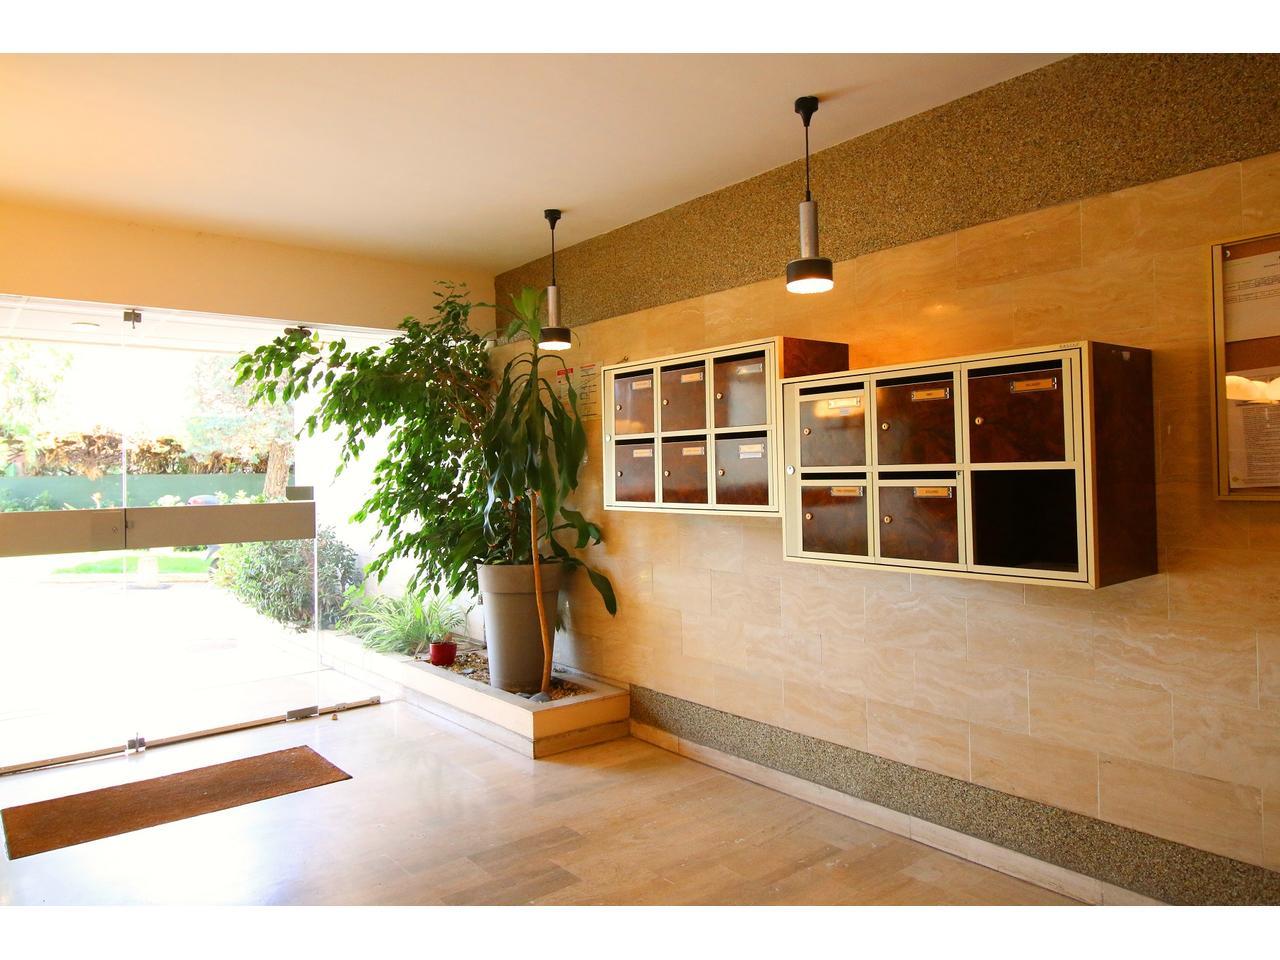 Immobilier Appartement Antibes Appartement 3 Pieces 83 M pour Residence Les Oliviers Chemin De La Peyregoue Antibes